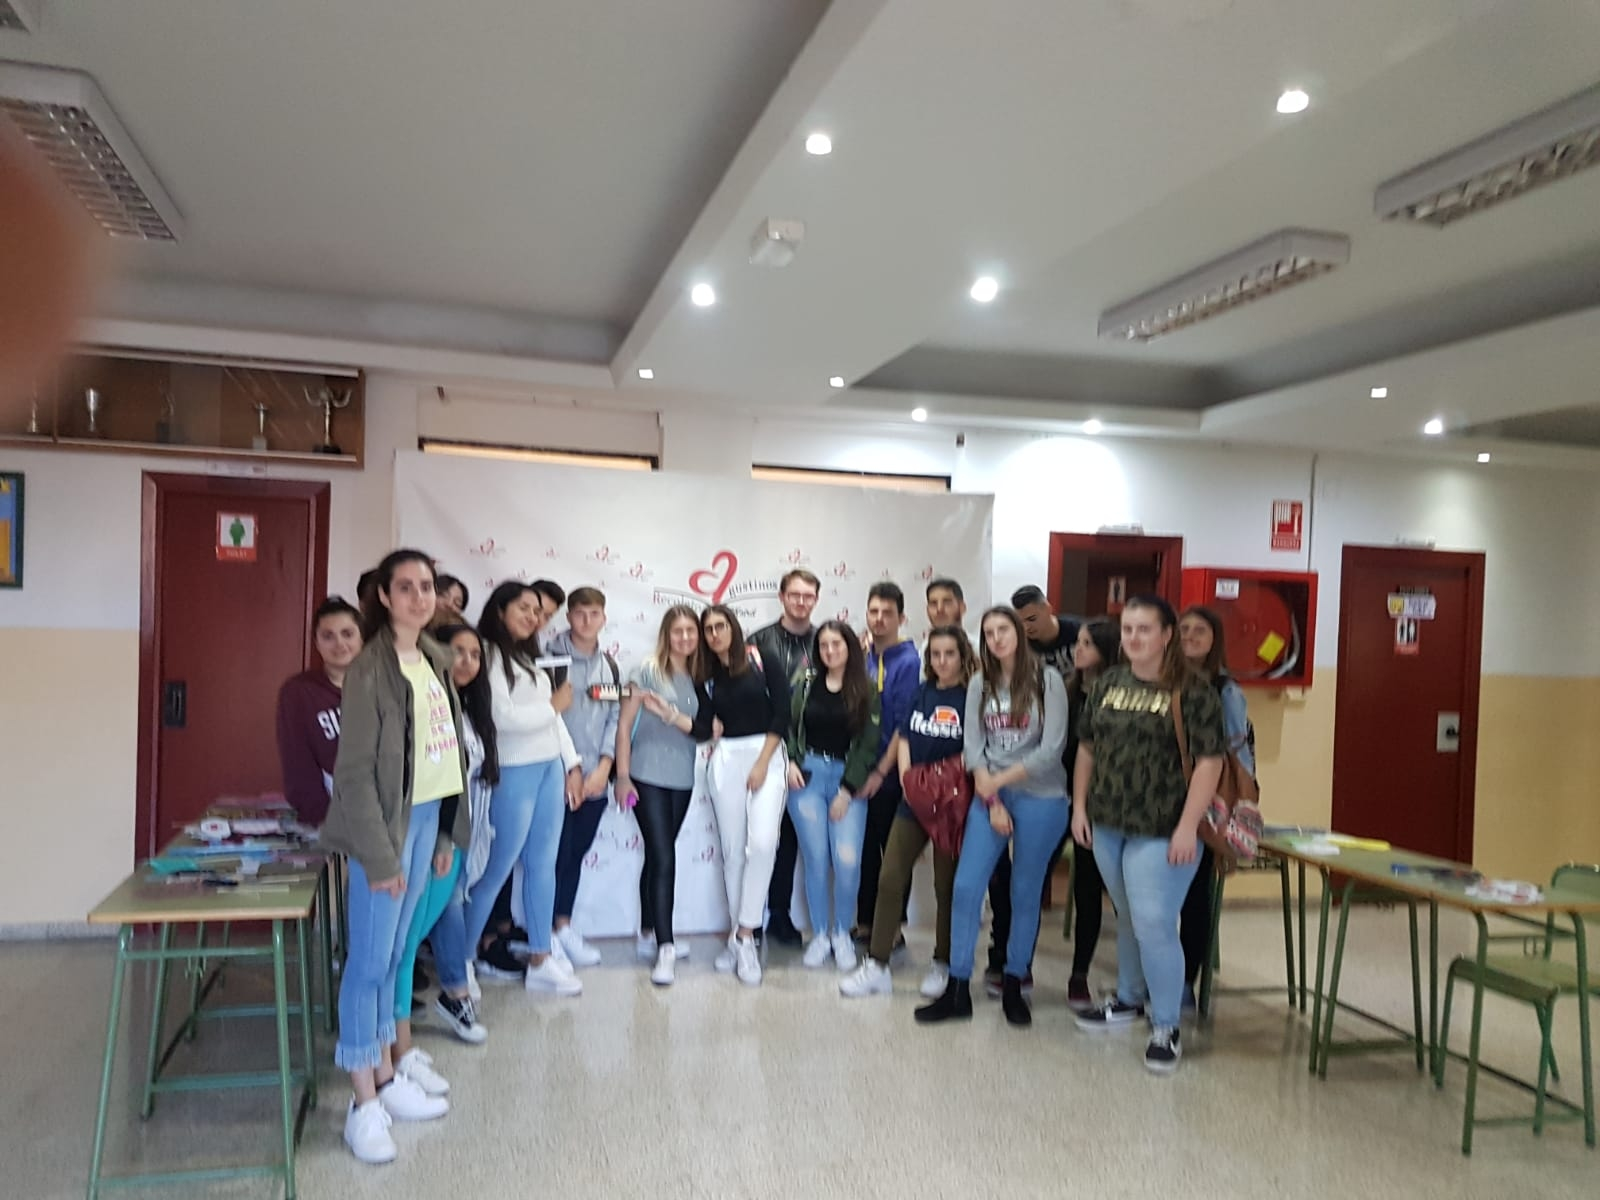 visita-CF-Motril-Salobreña-2019-11